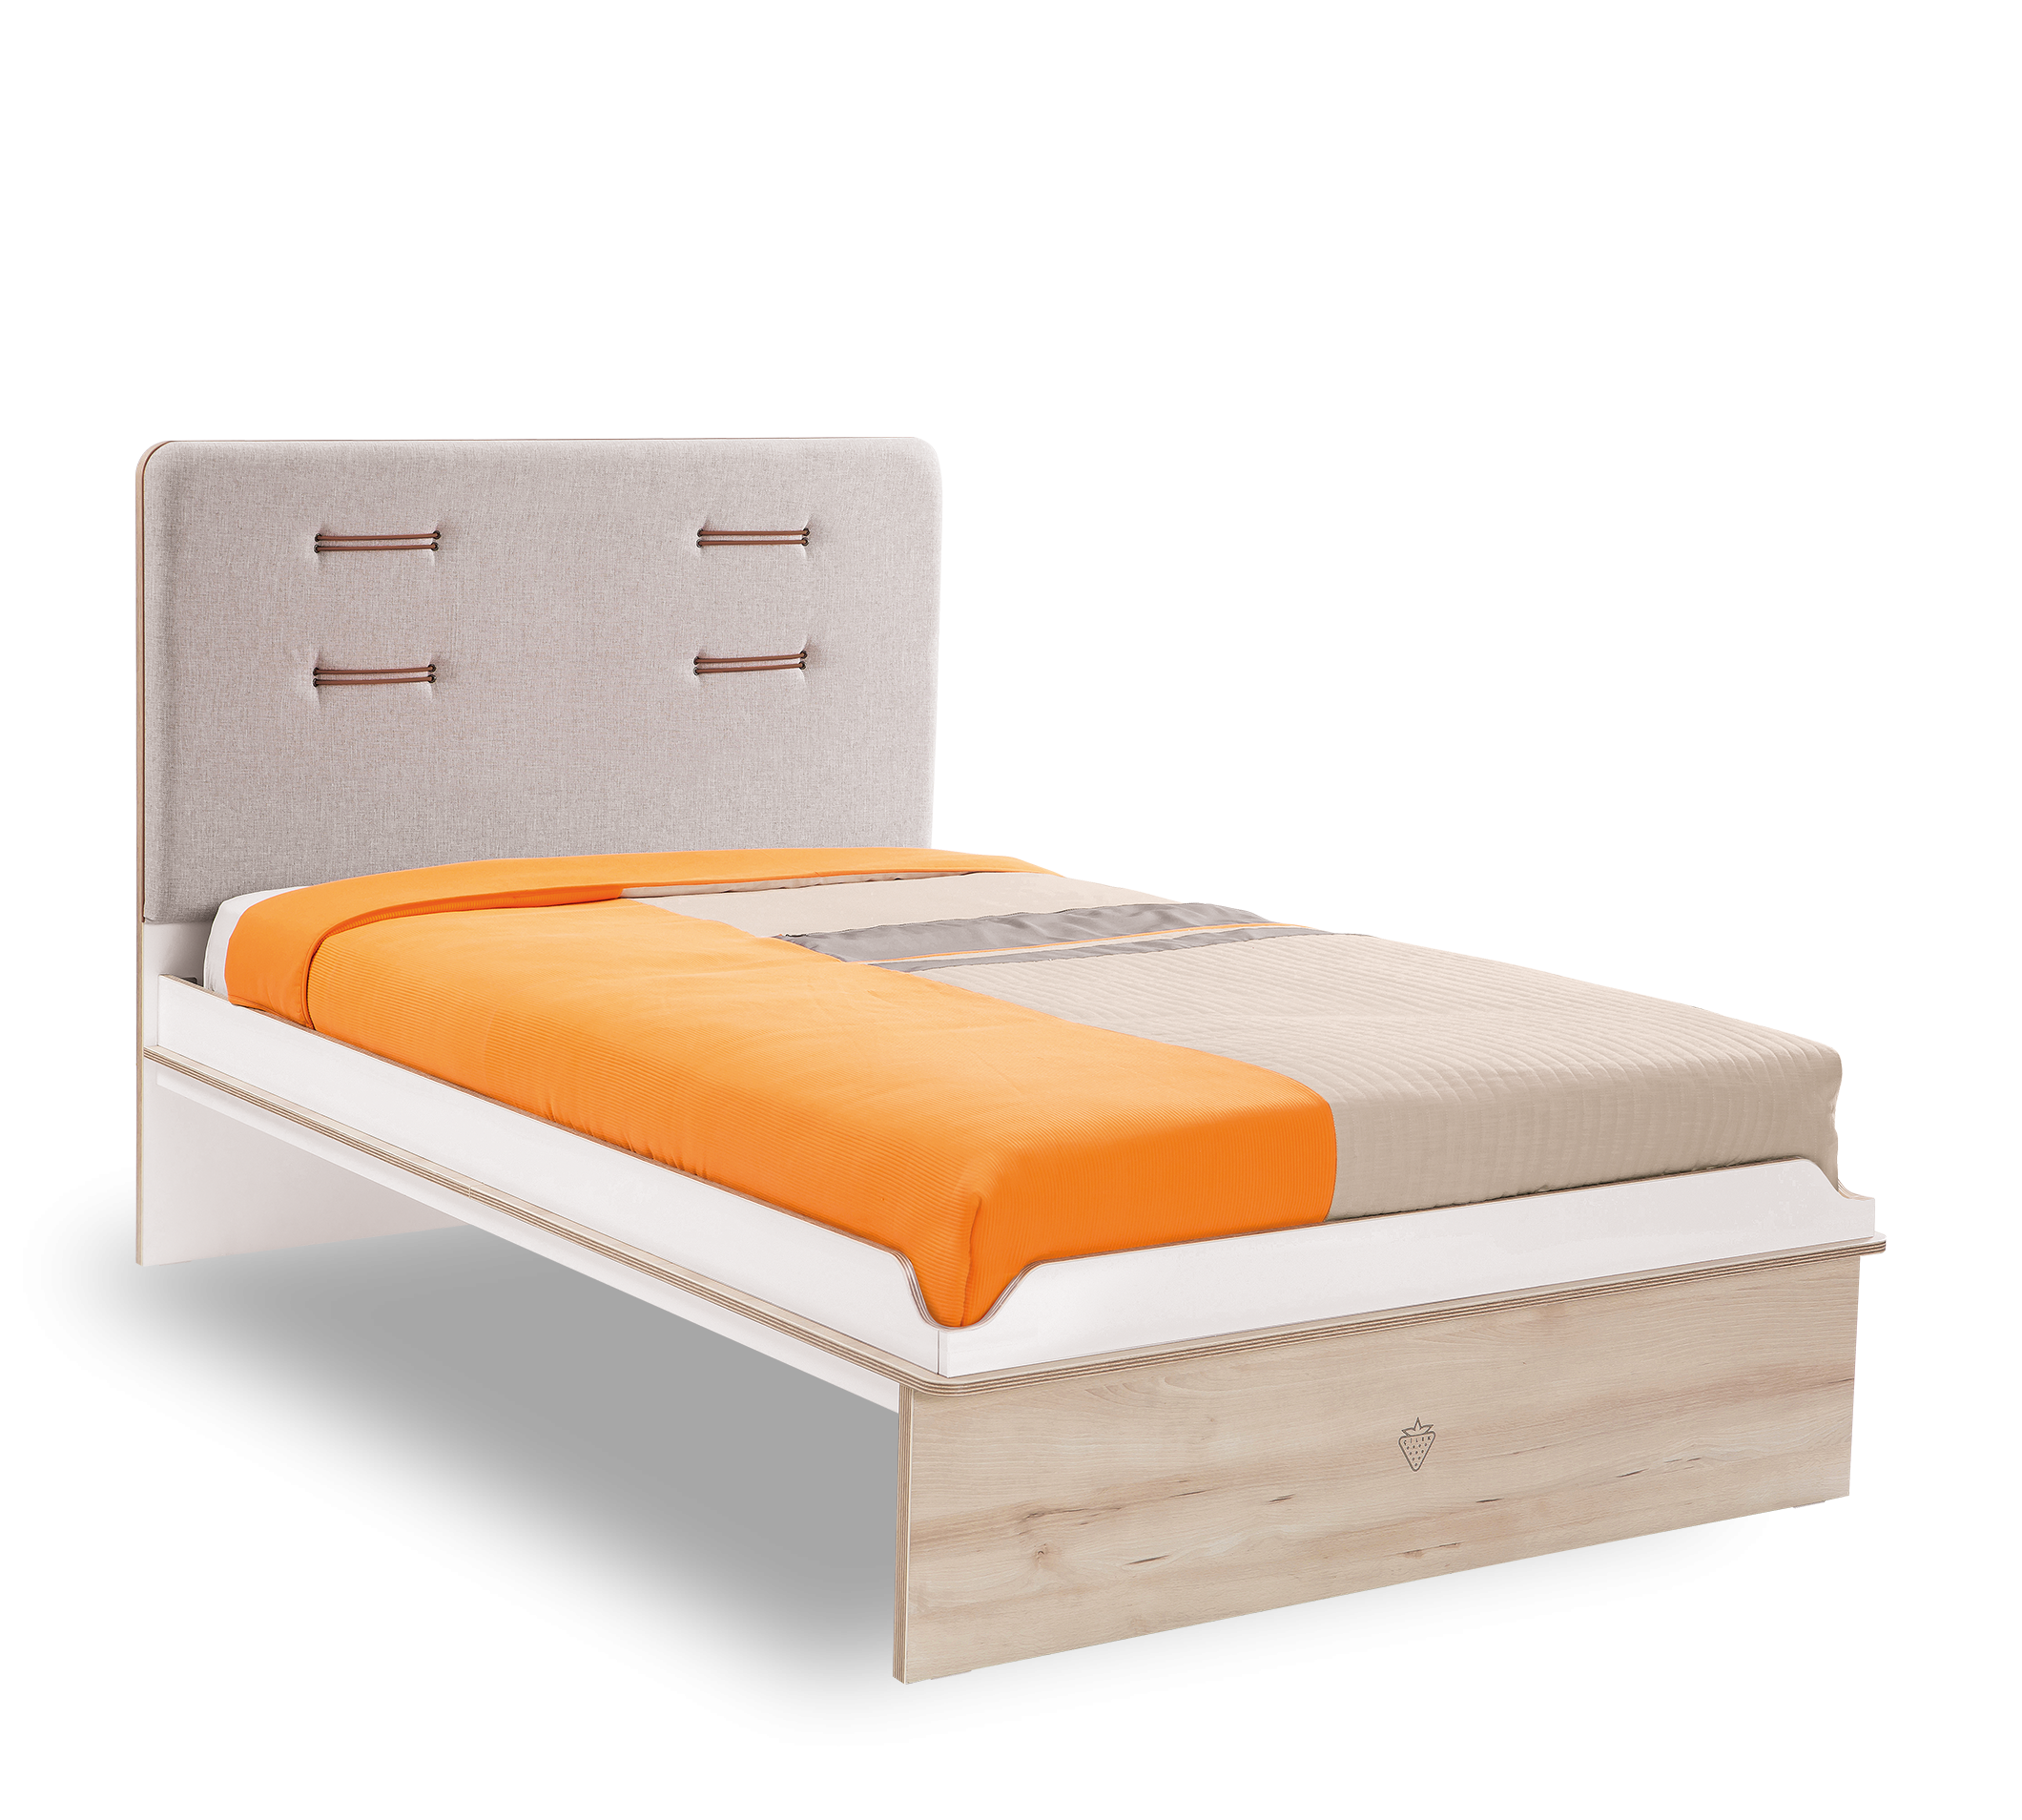 Full Size of Dynamic Bett 120x200 Cm Lek Japanische Betten Barock 100x200 120x190 140x200 Ohne Kopfteil Metall 1 40 Holz 180x220 180x200 Komplett Mit Lattenrost Und Bett 120x200 Bett